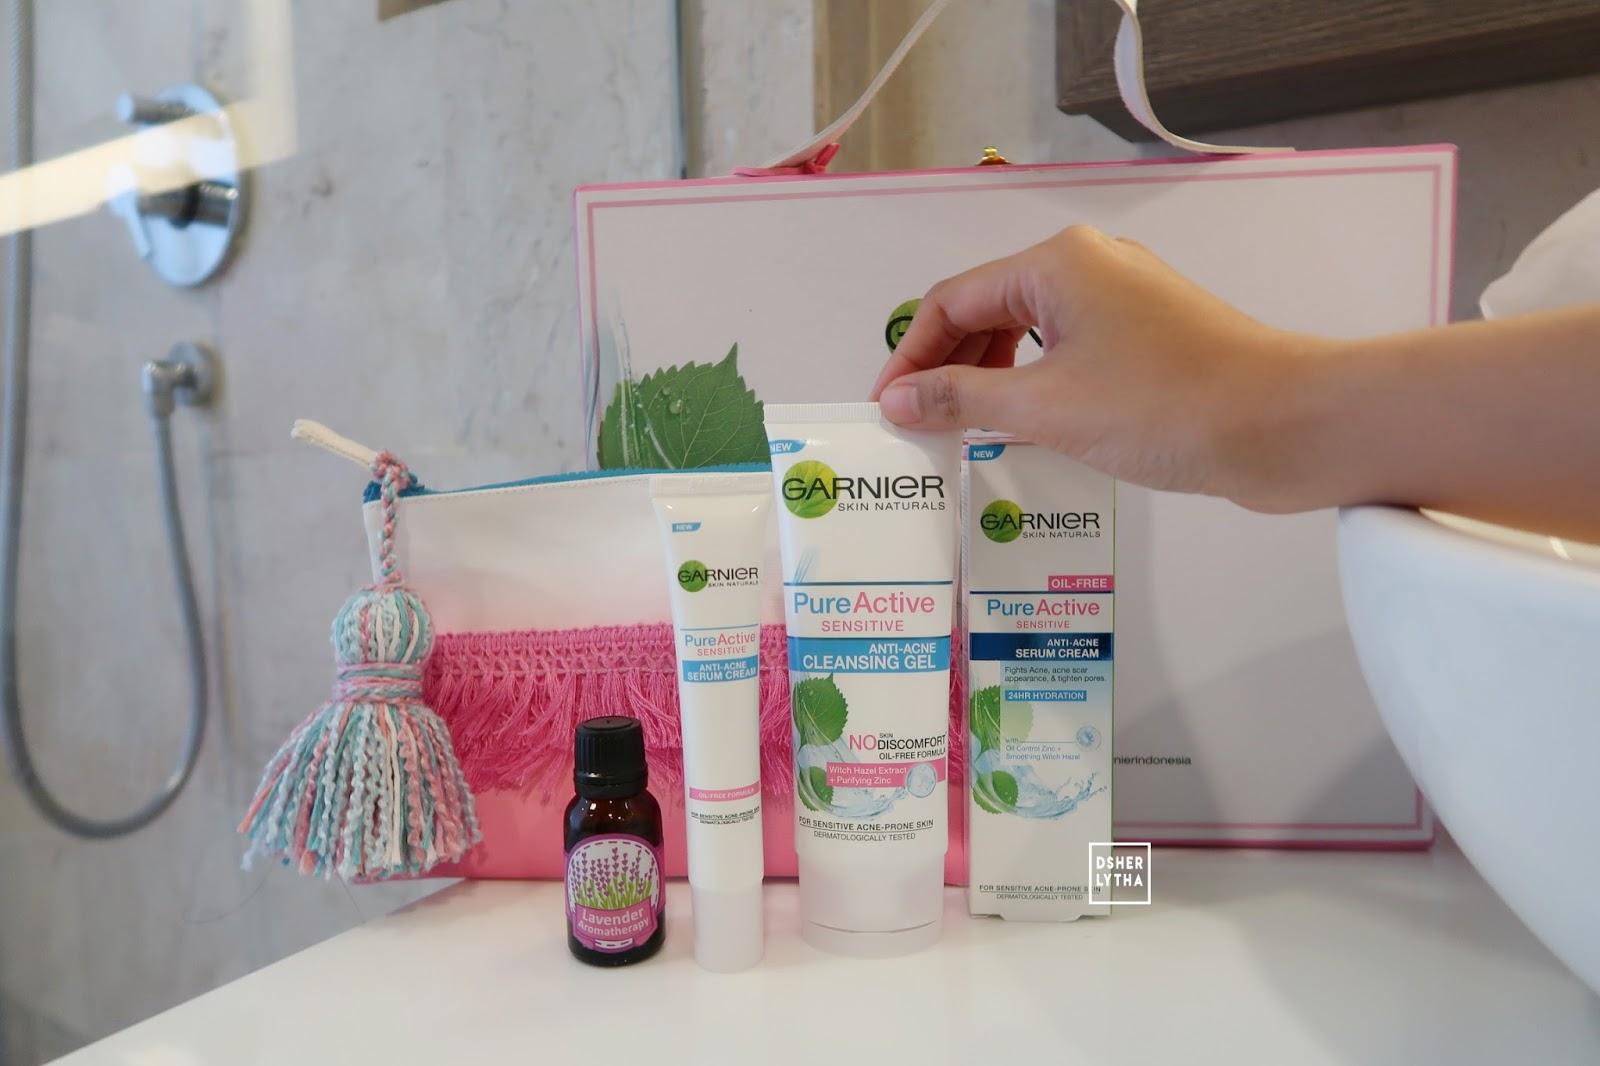 Review Garnier Pure Active Sensitive Its Time To Use The Right Anti Acne Cleansing Gel Foam 100 Ml Contohnya Kayak Yang Bakal Aku Sekarang Yaitu